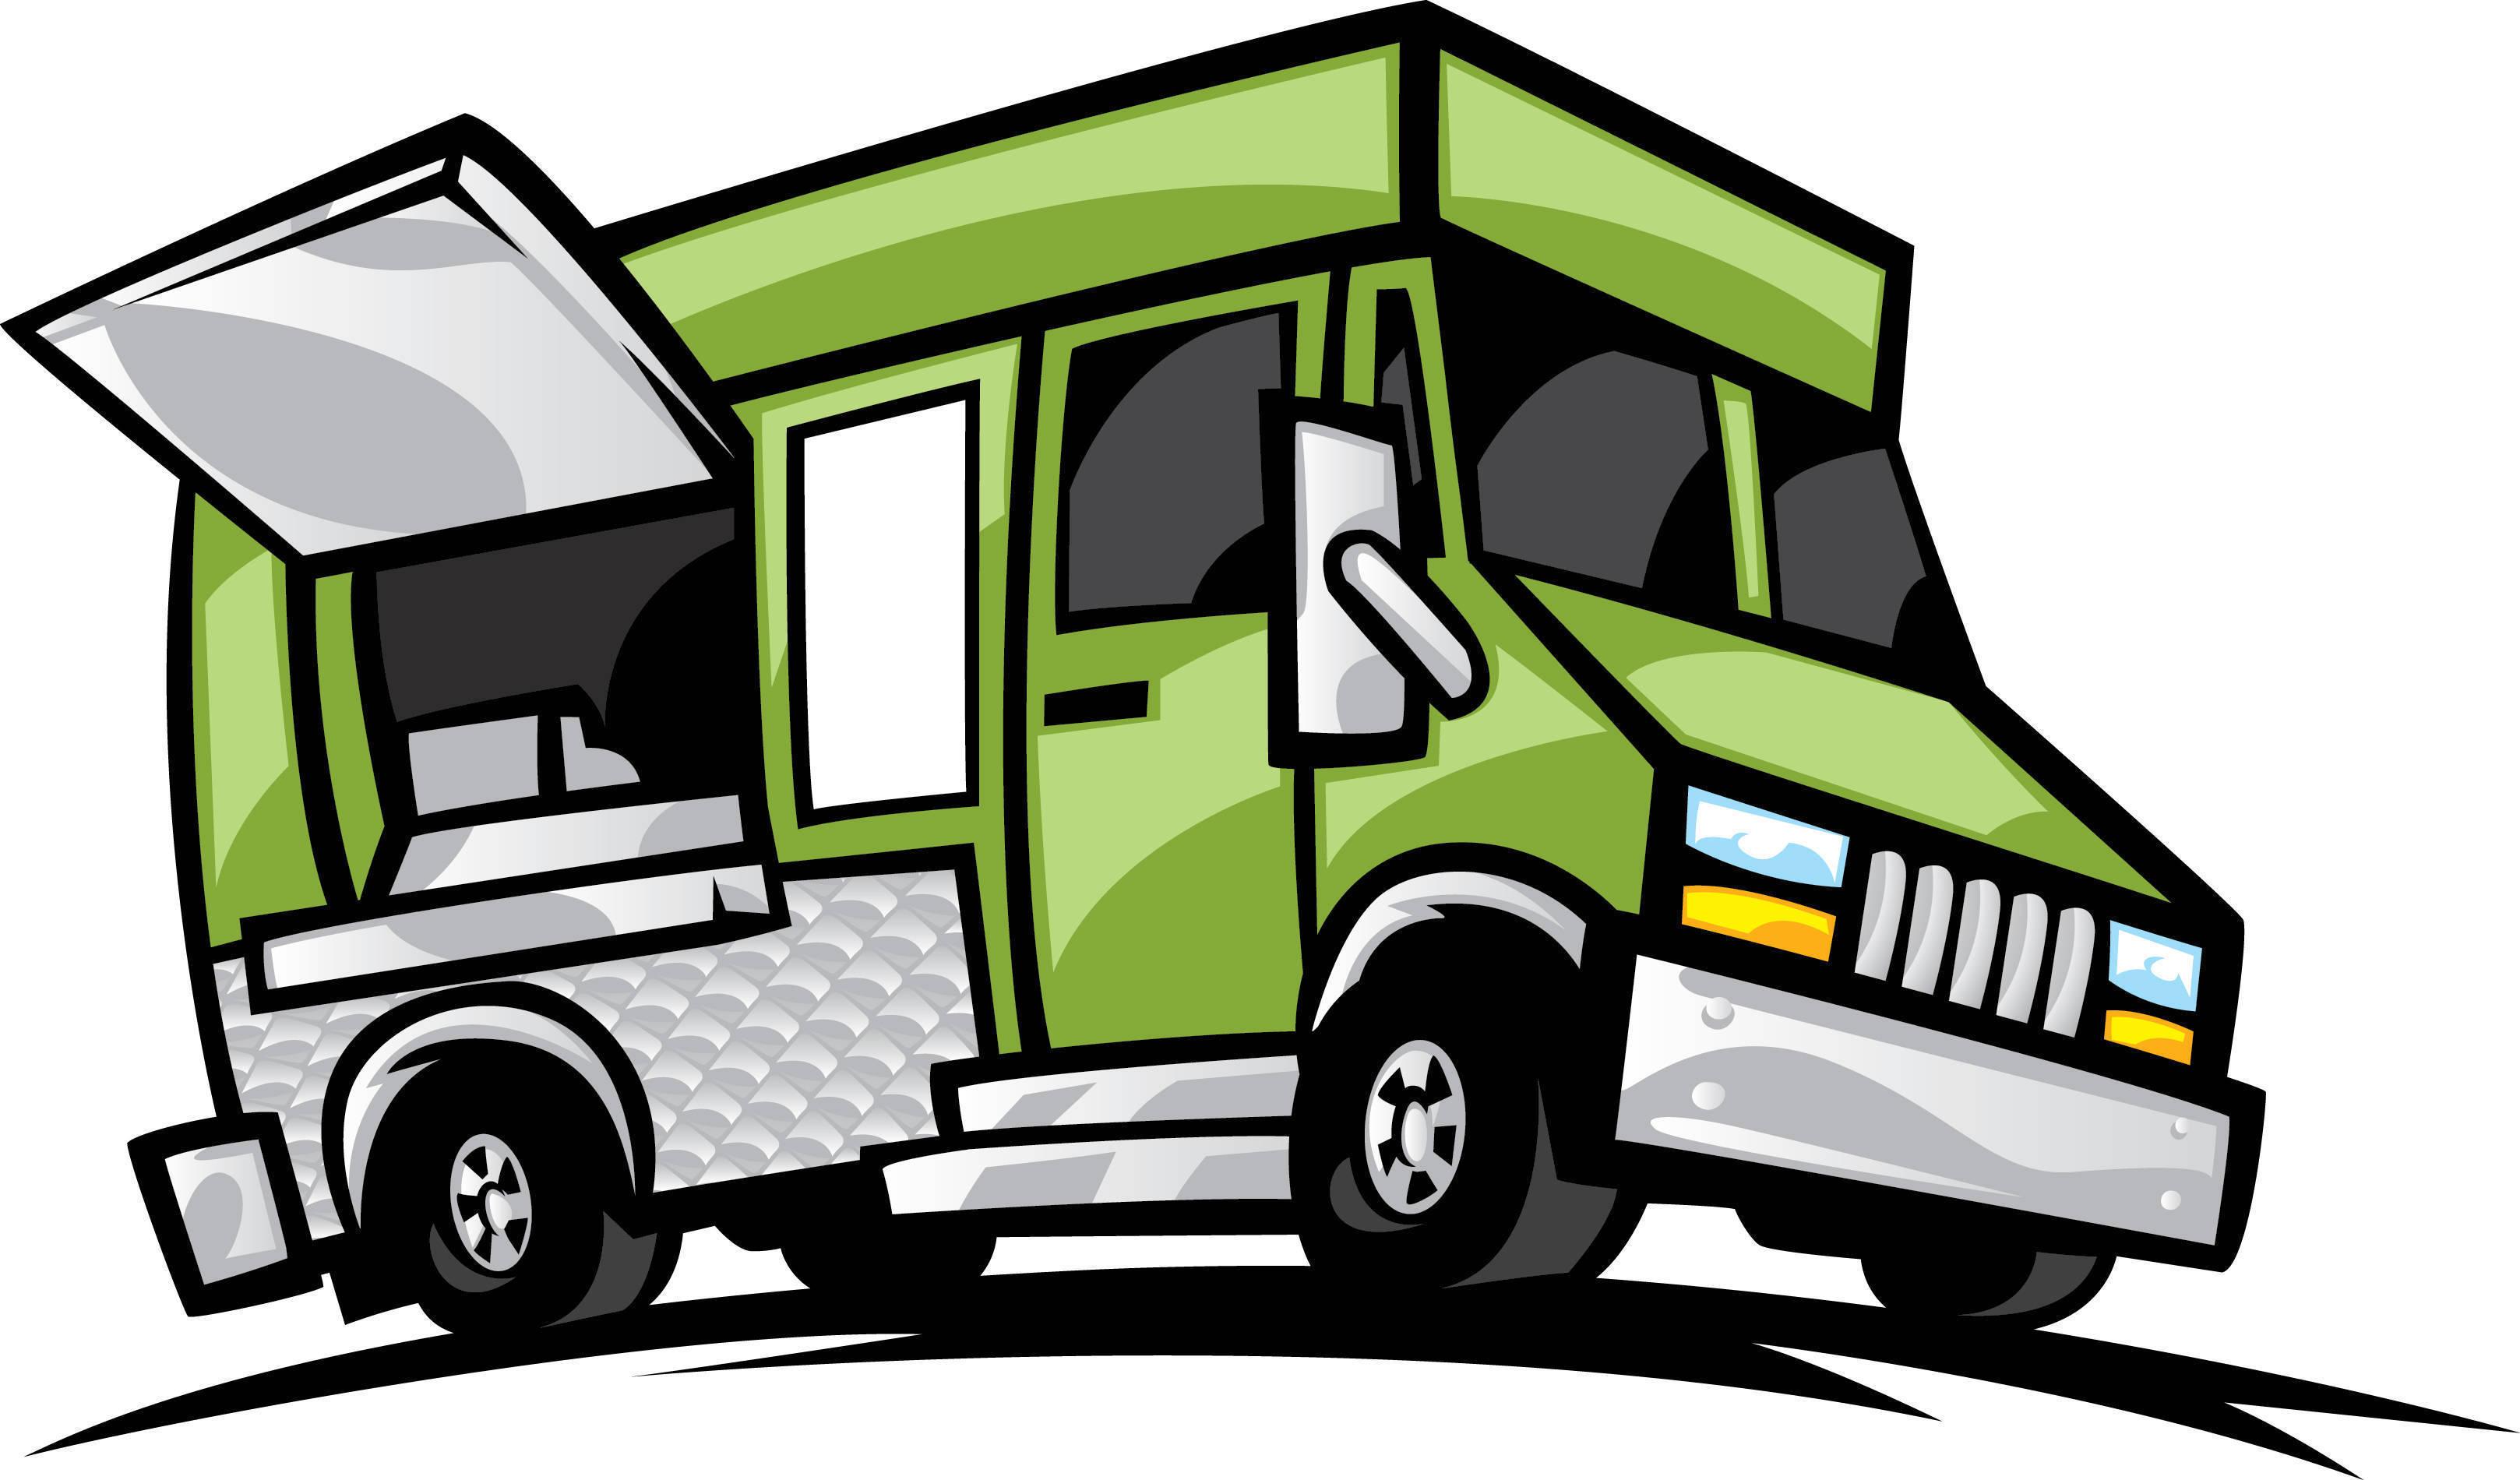 b2c4eebe920540e2594b_c26481c00fe68cd72b0e_wpid-food-truck.jpg